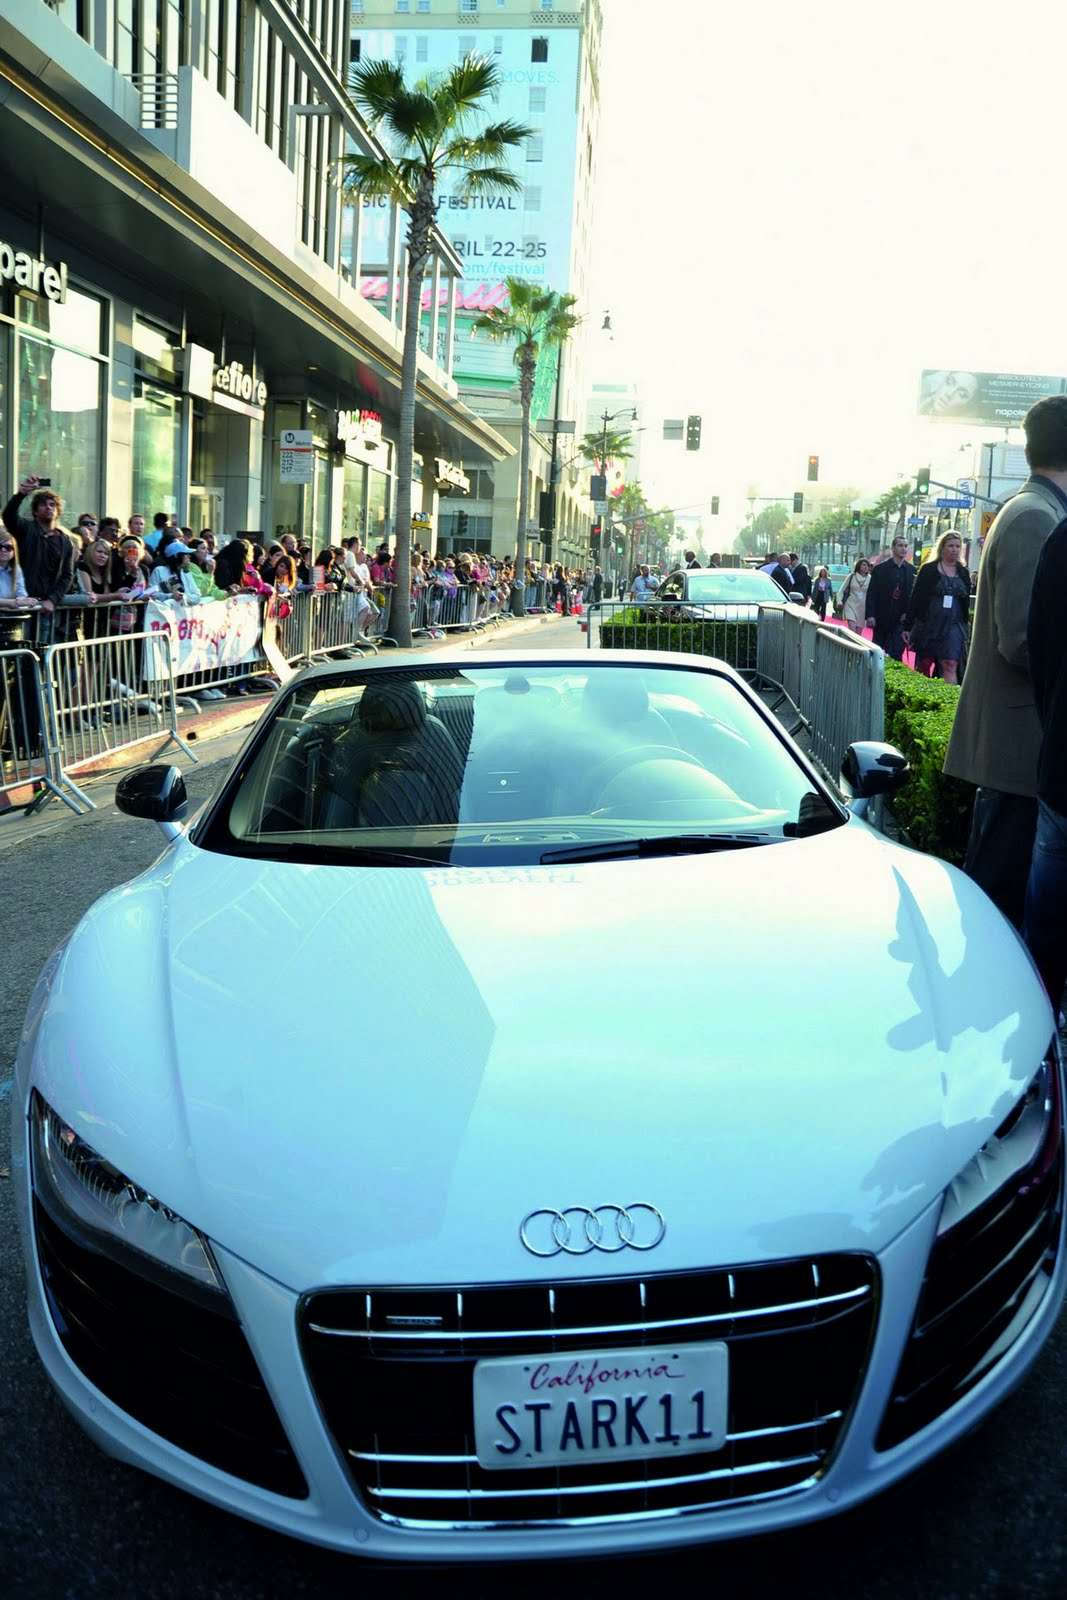 Audi R8 Spyder Iron Man 2 2010